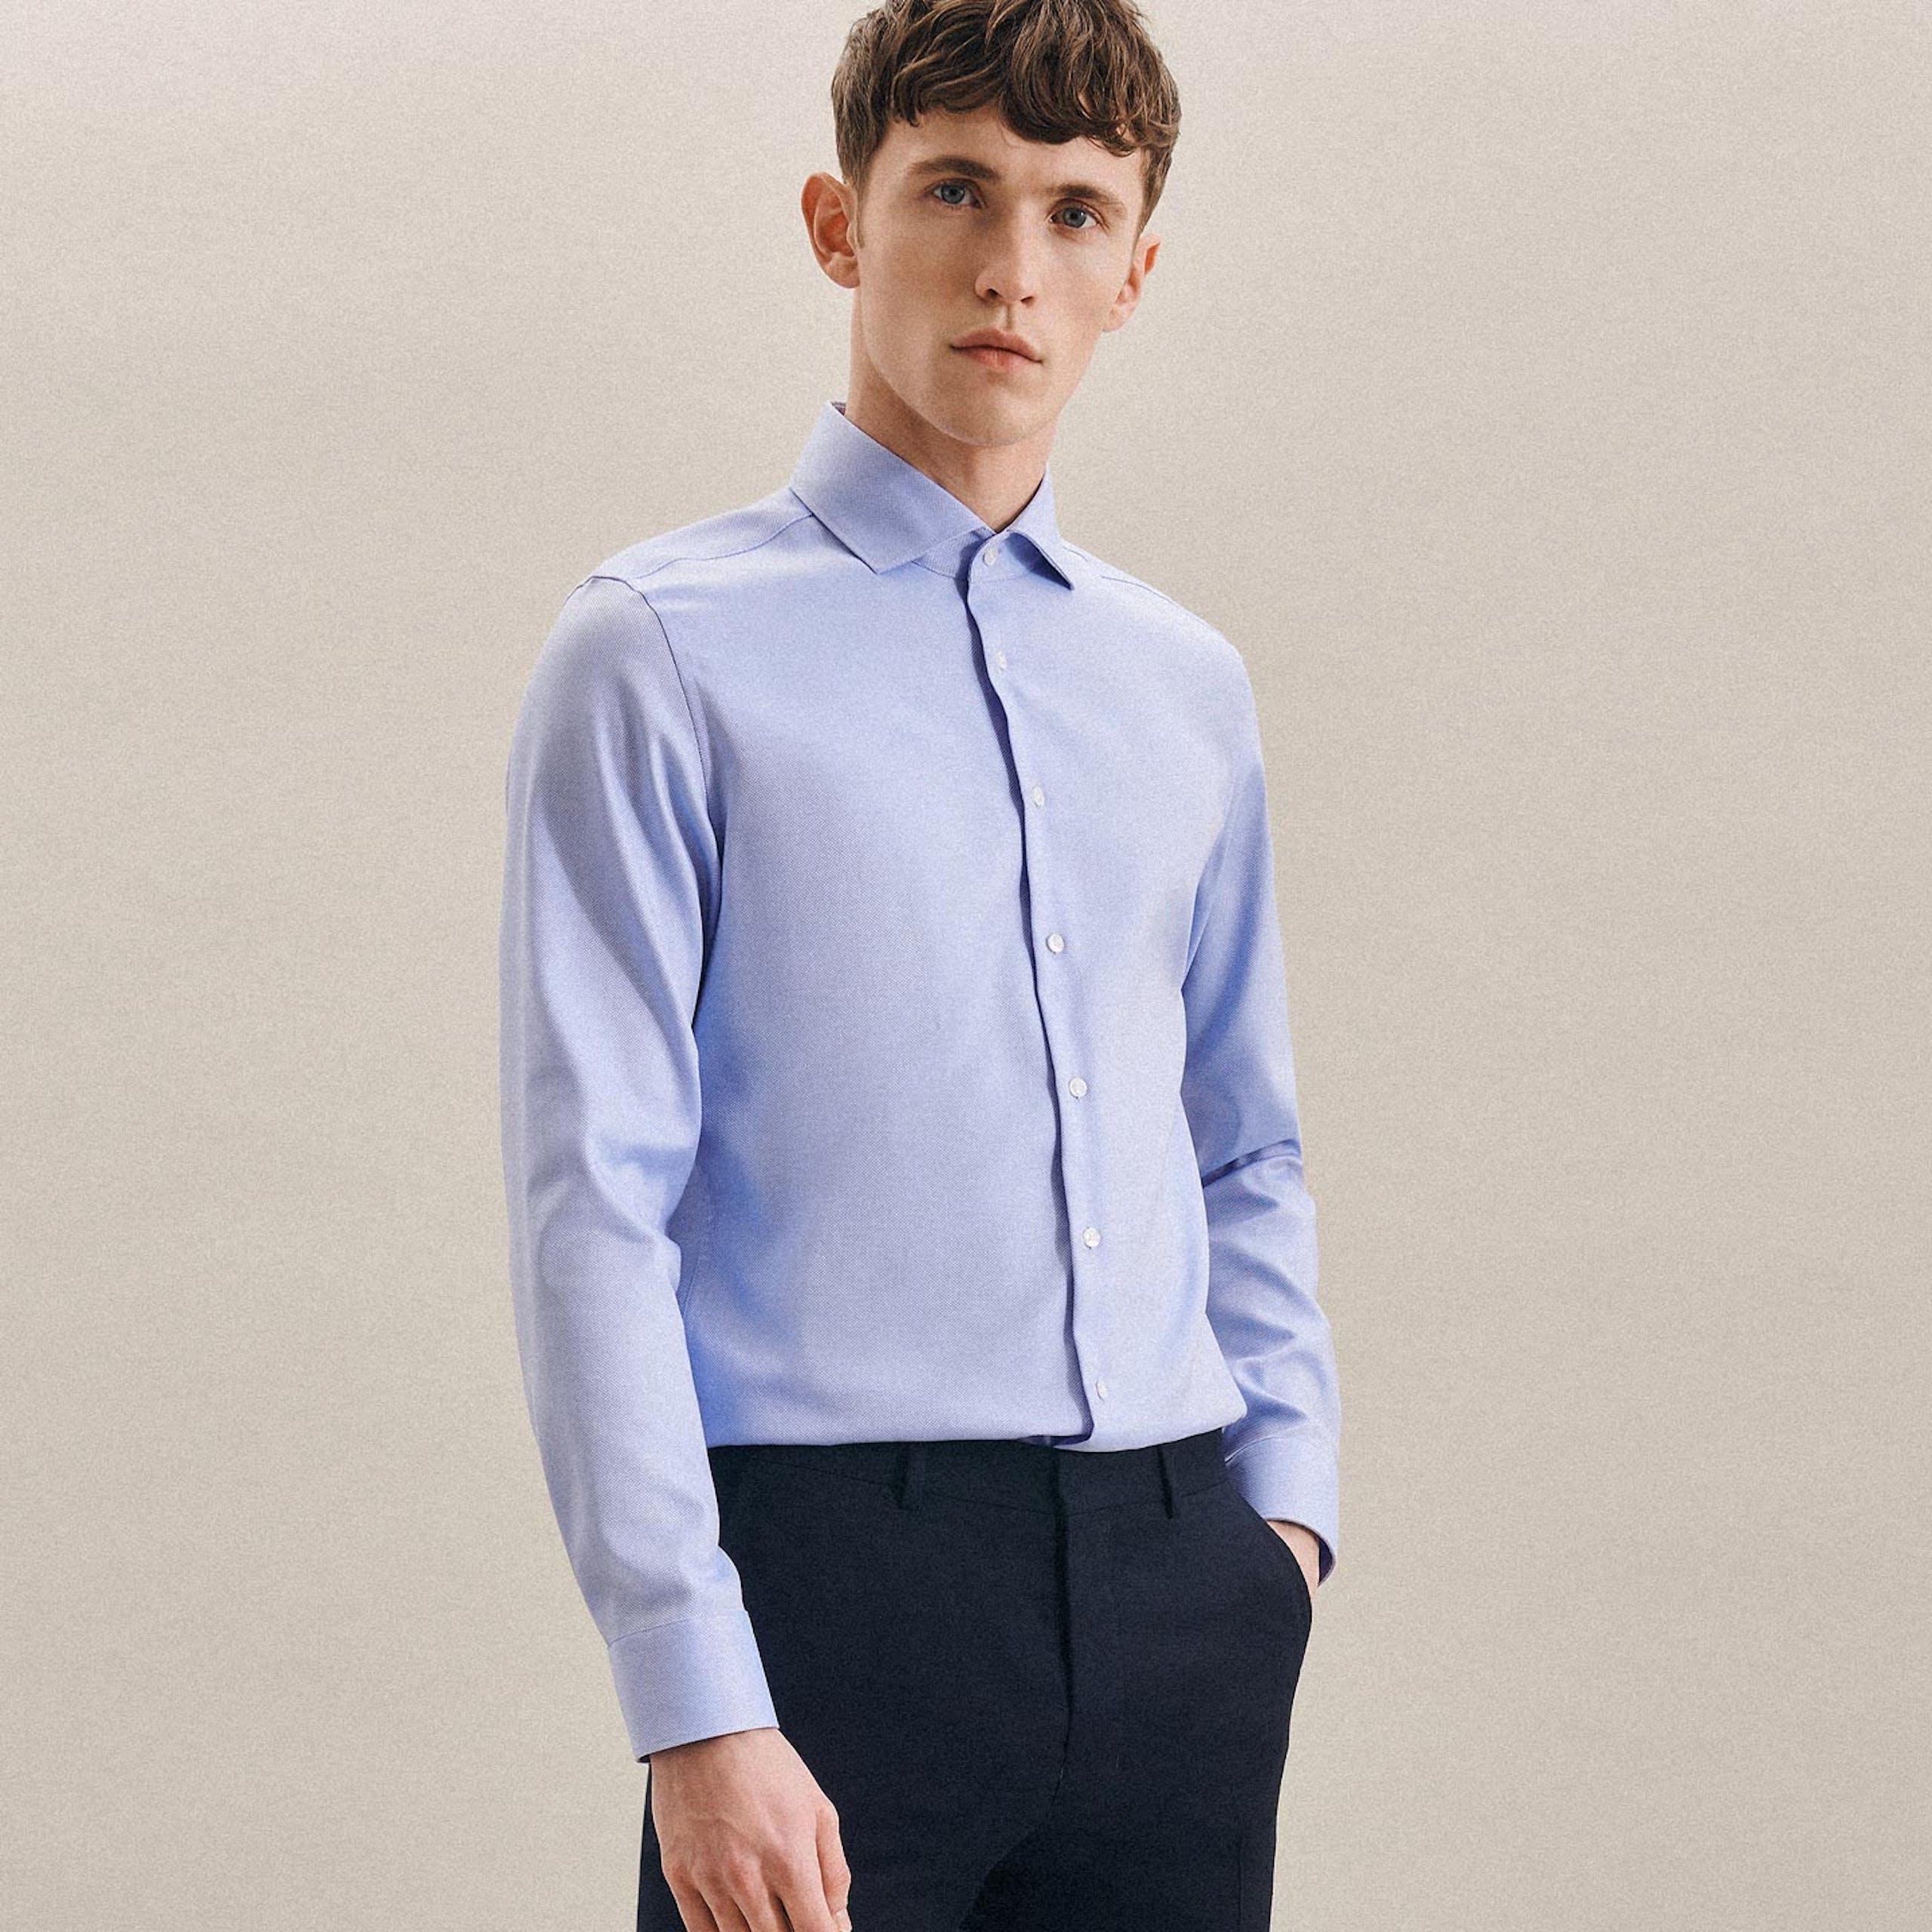 Blickdichte Hemden | Seidensticker